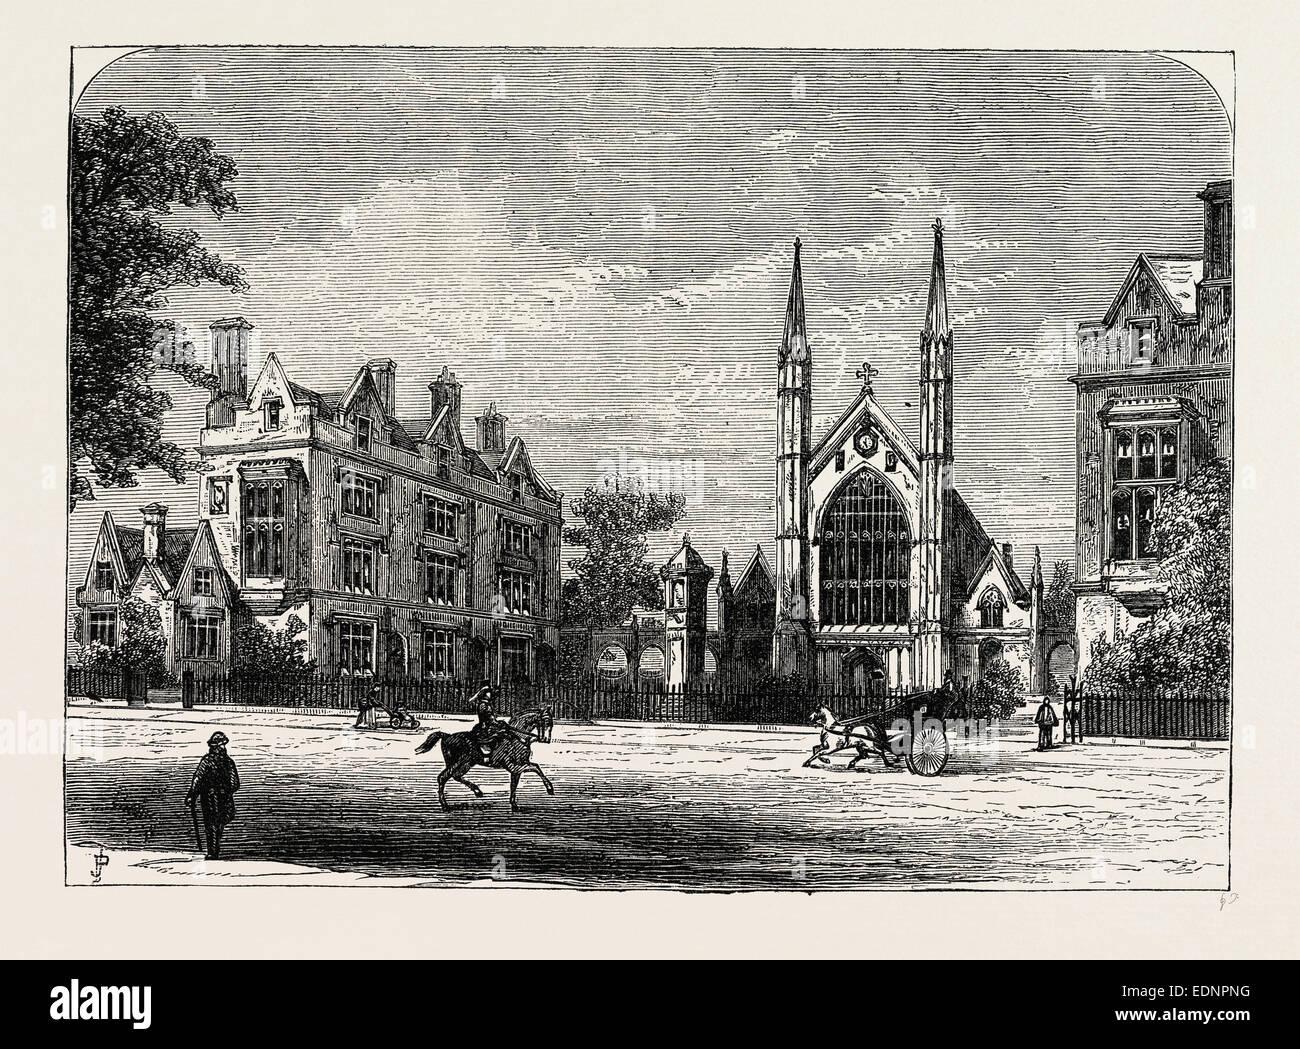 ST  KATHARINE'S HOSPITAL London, UK, 19th century engraving